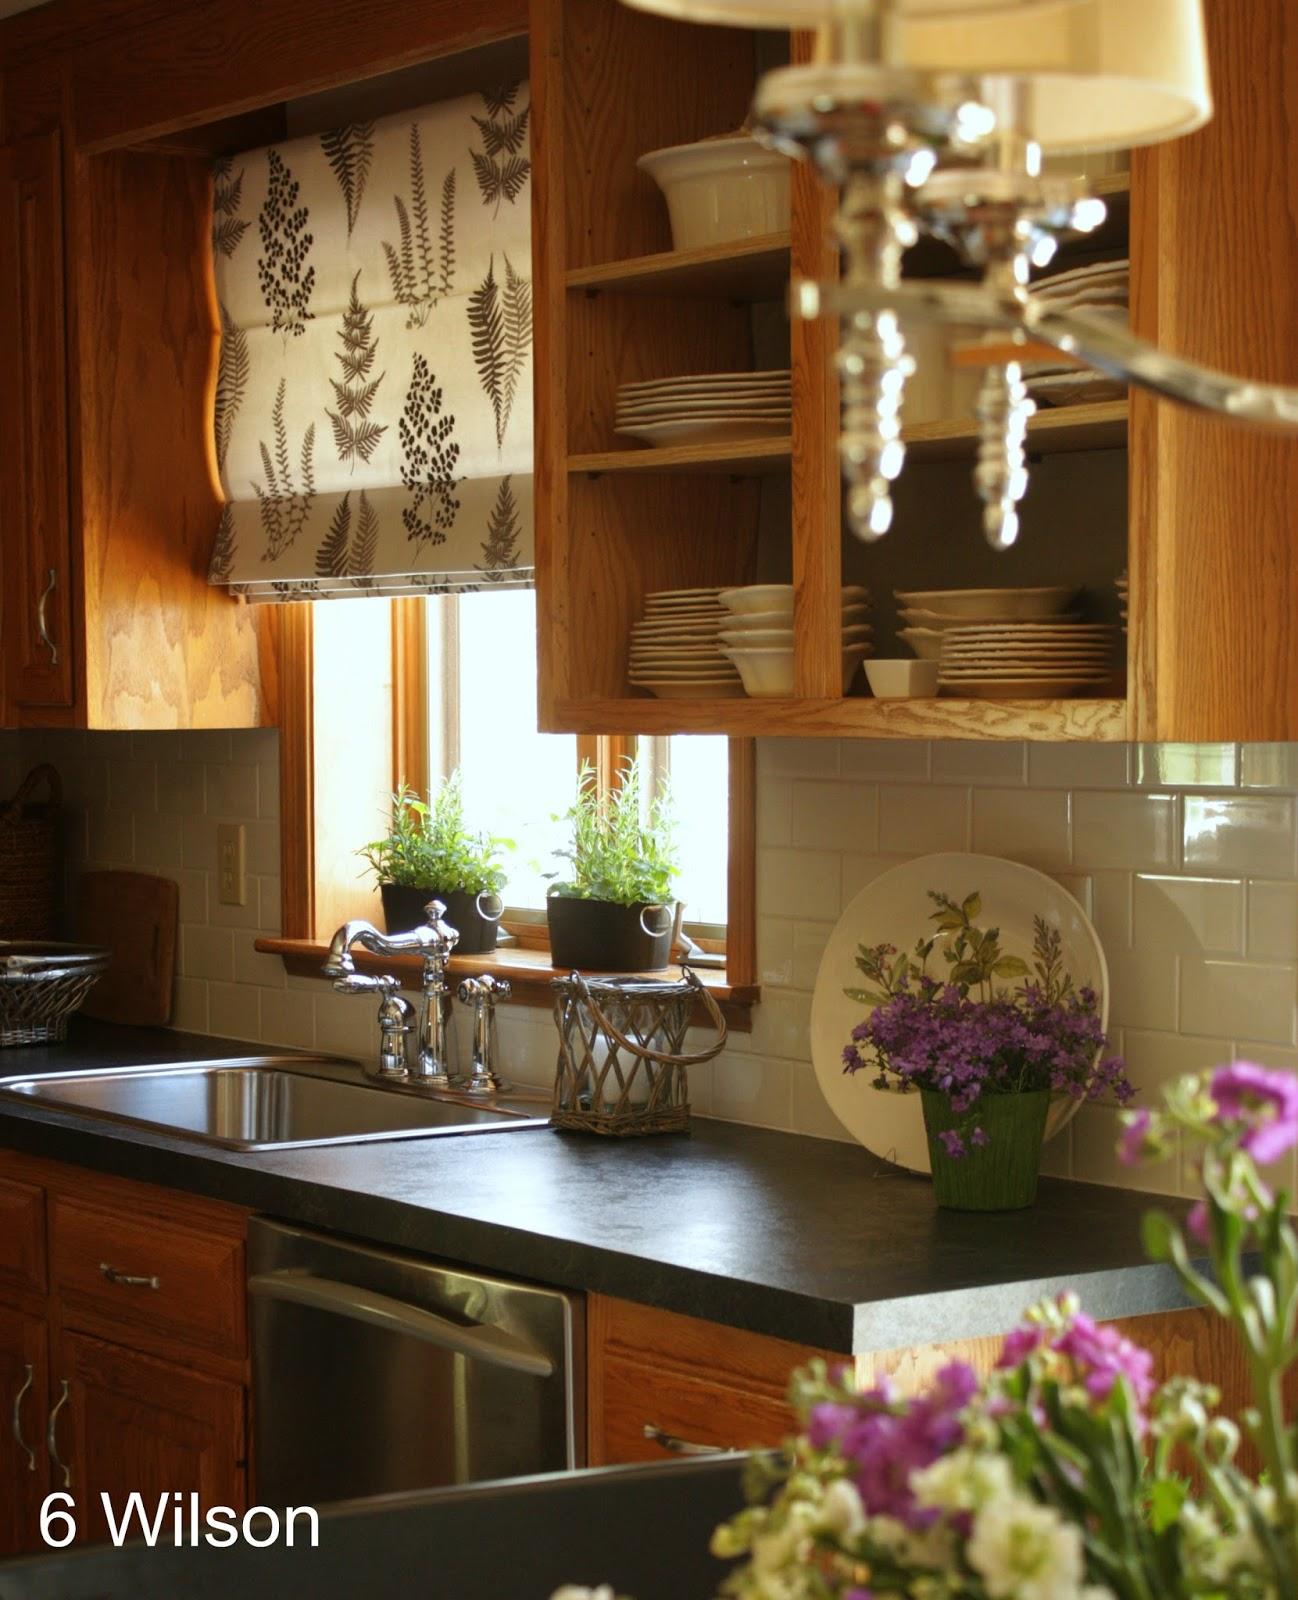 Great Ideas To Update Oak Kitchen Cabinets: Oak Cabinets, Honey And Kitchen Ideas On Pinterest